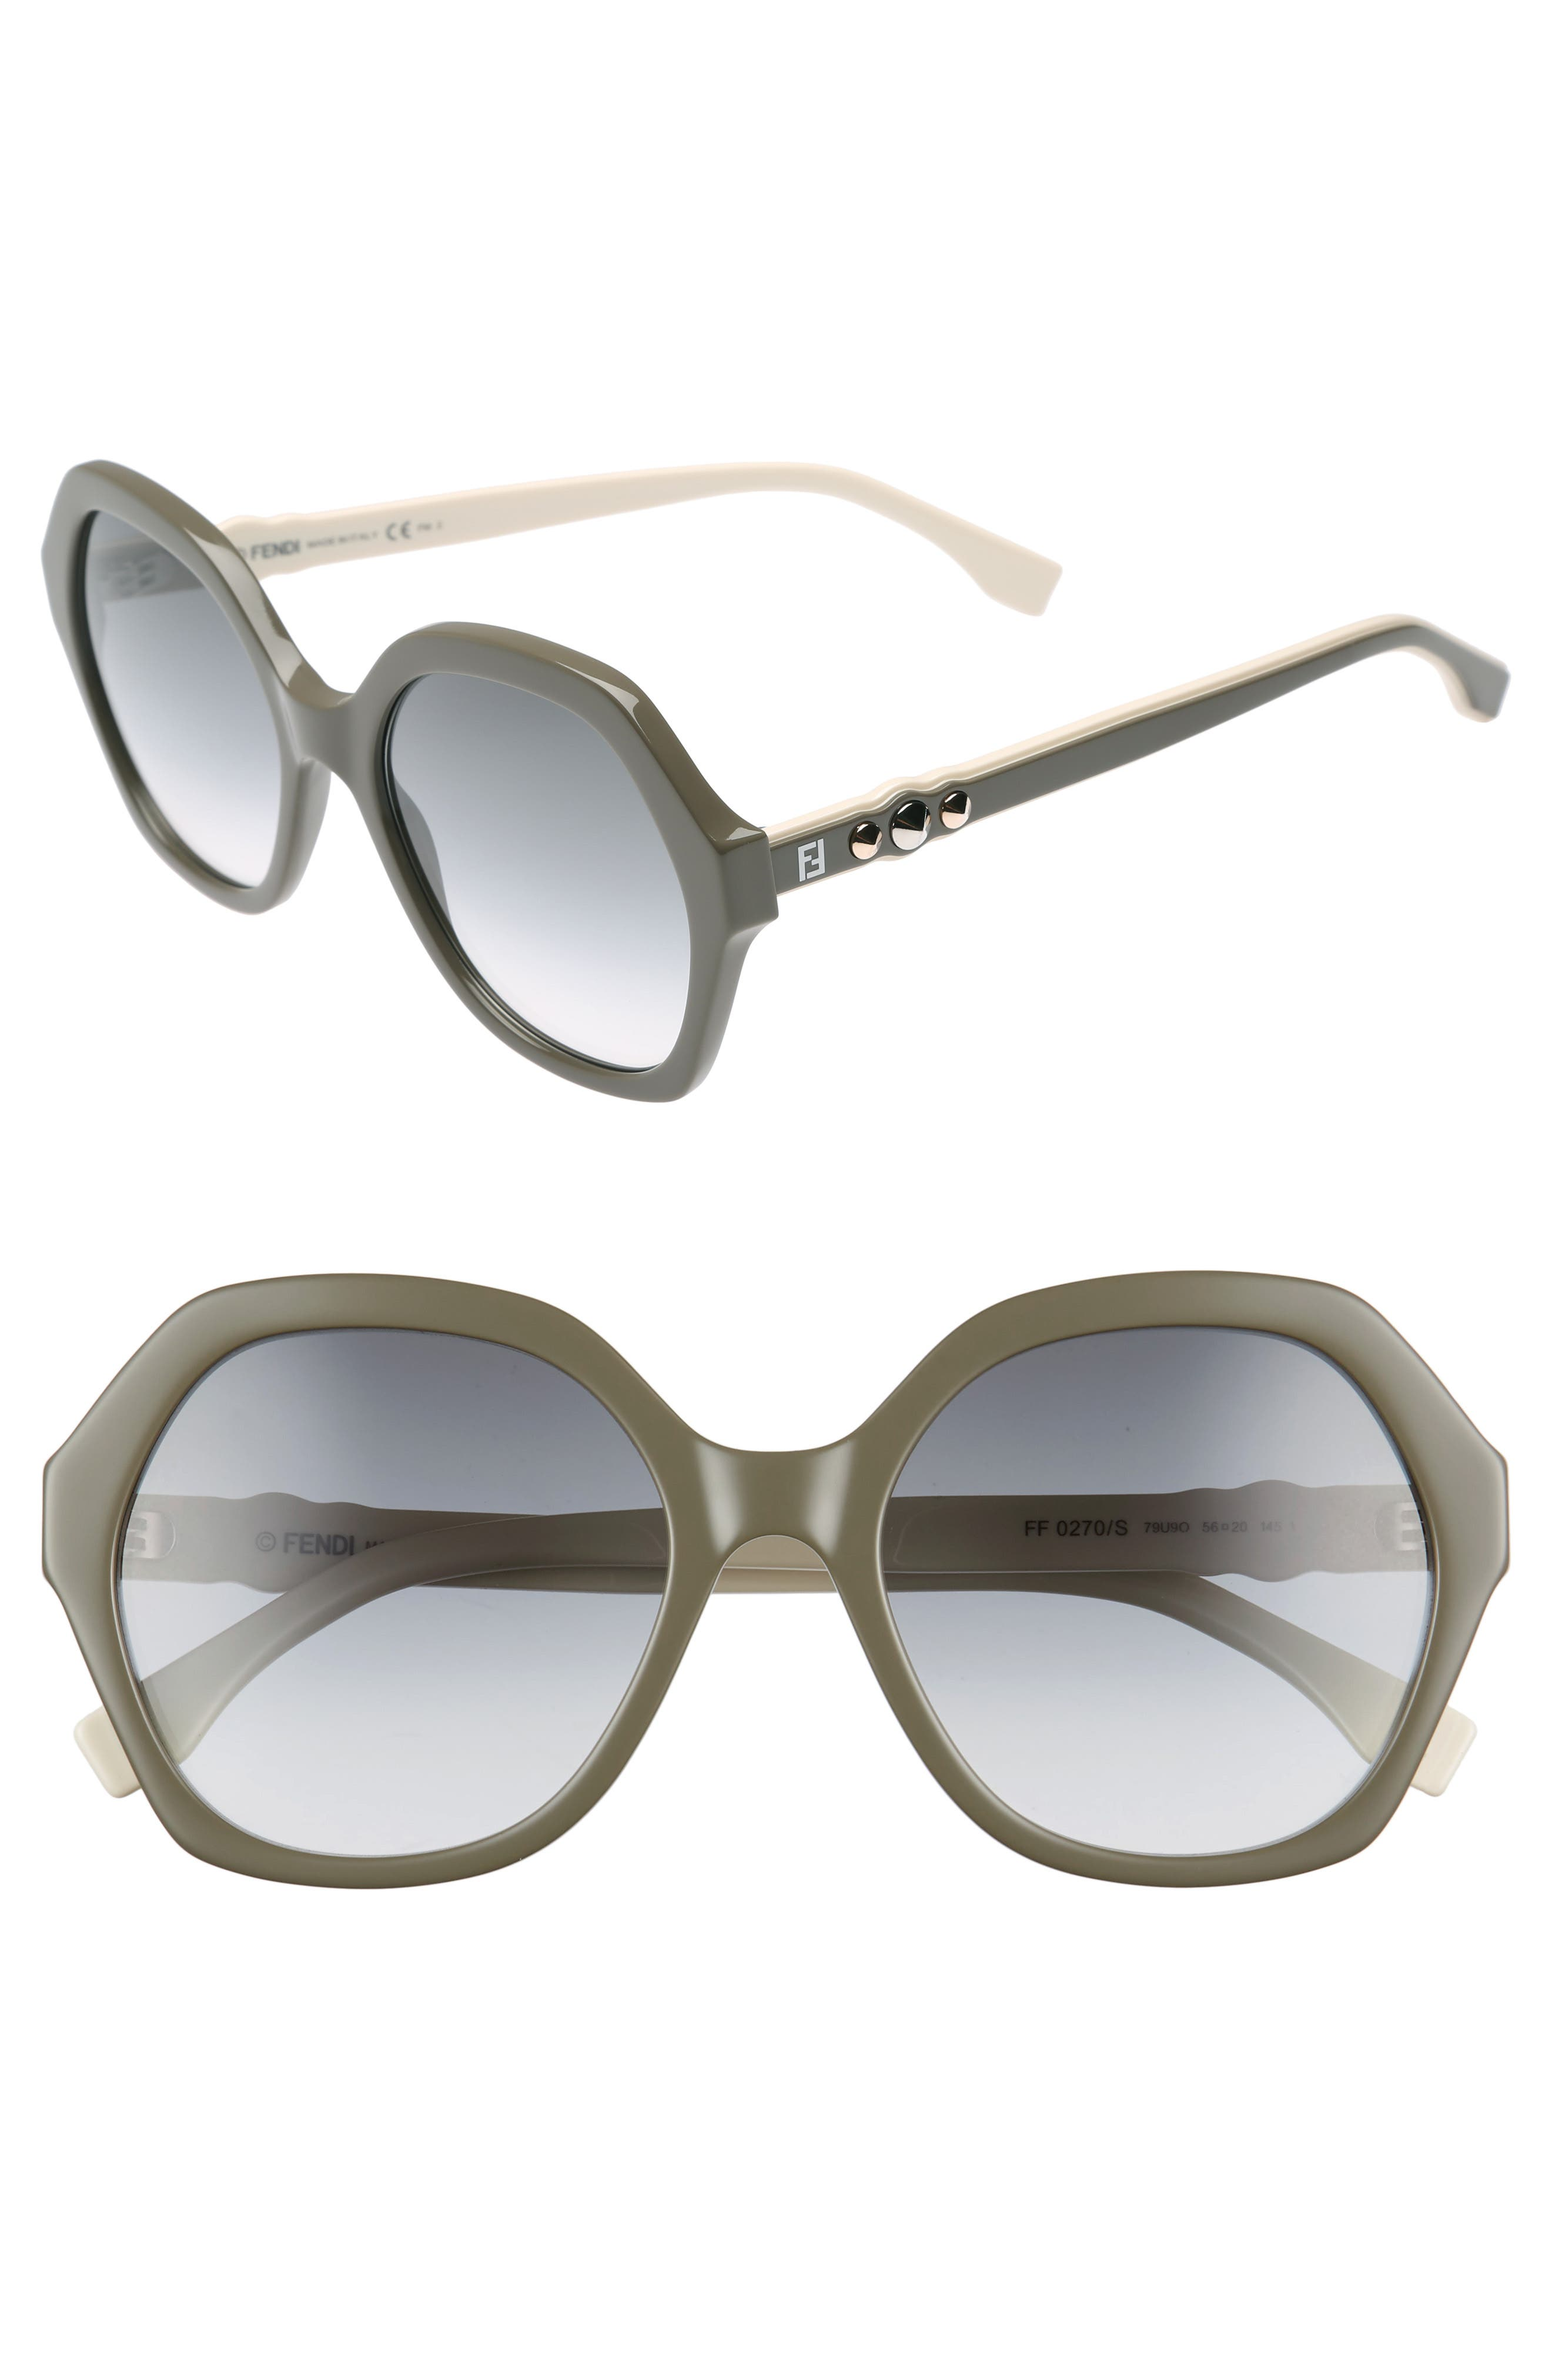 56mm Oversize Sunglasses,                             Main thumbnail 1, color,                             Mud